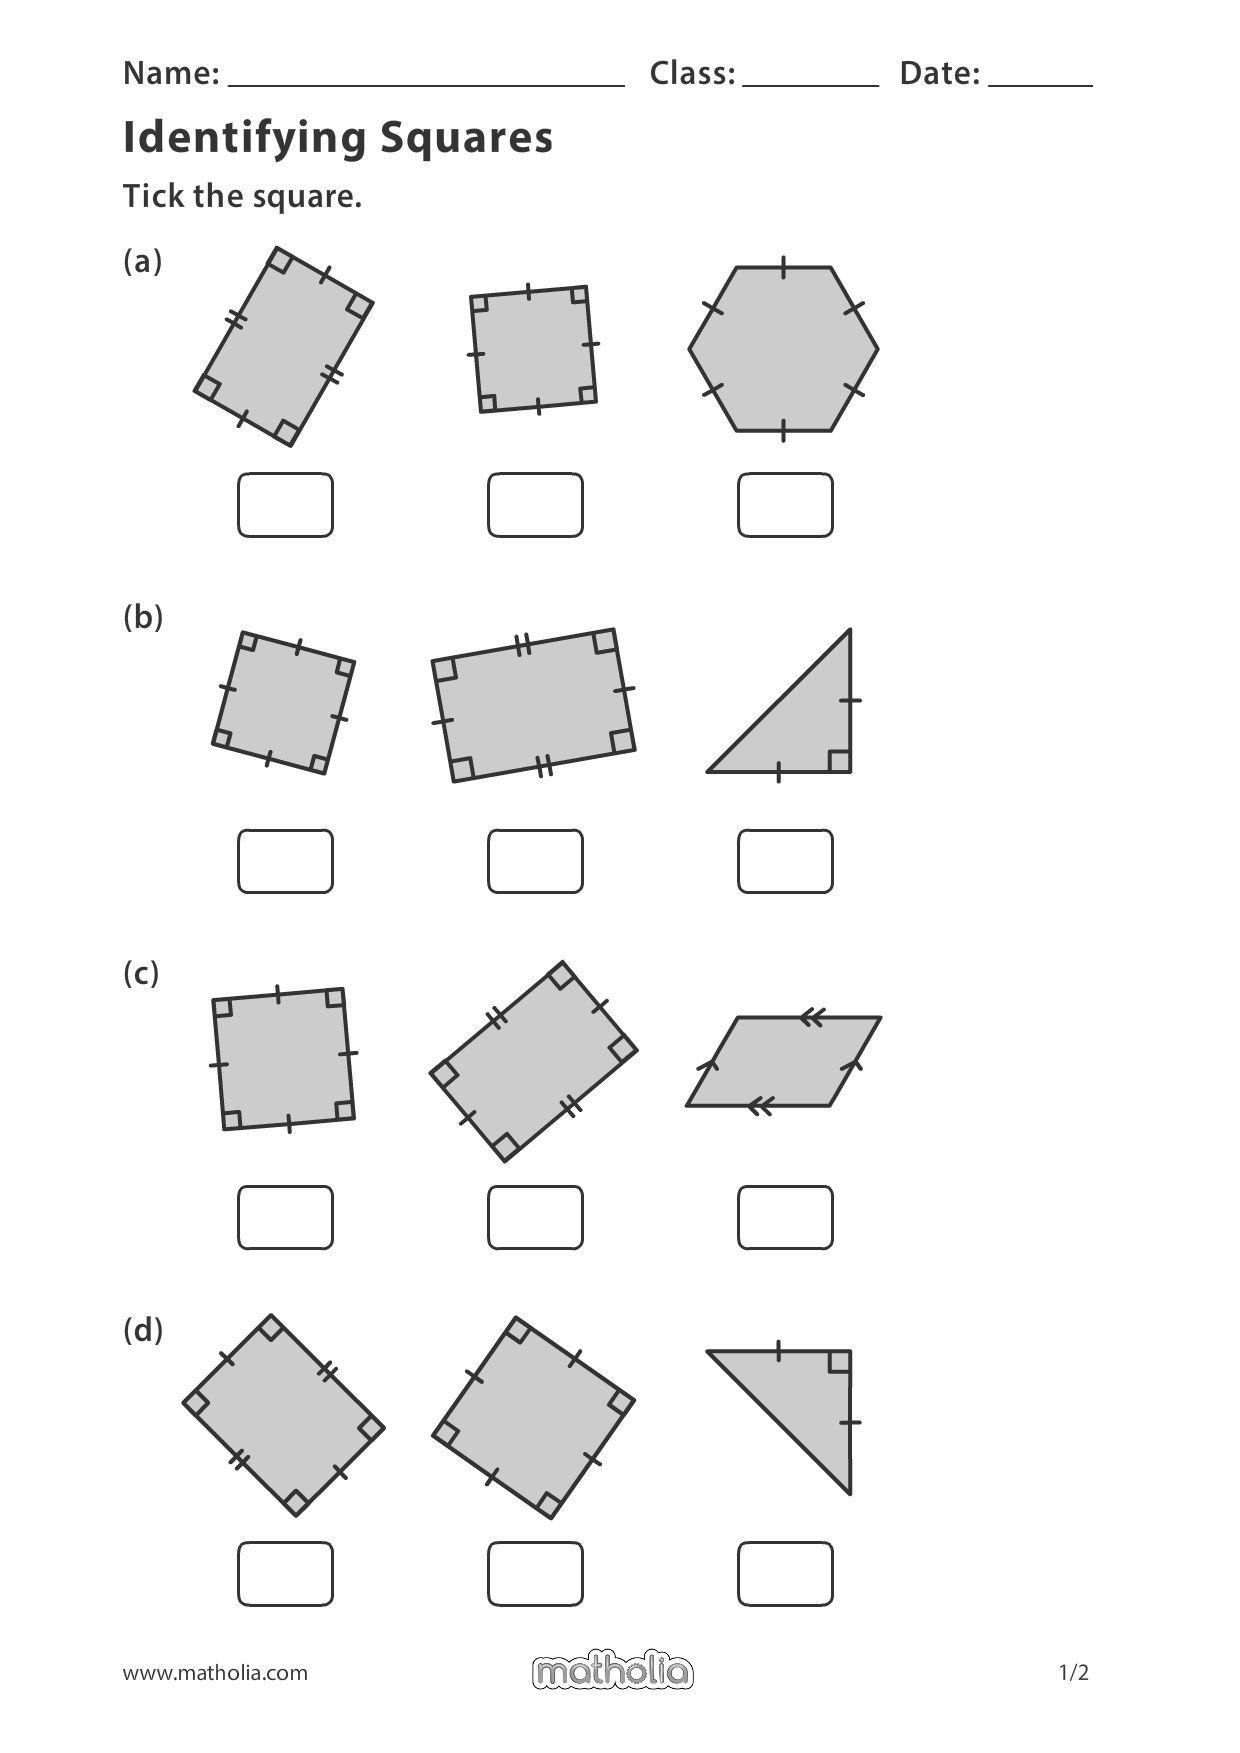 Identifying Squares In